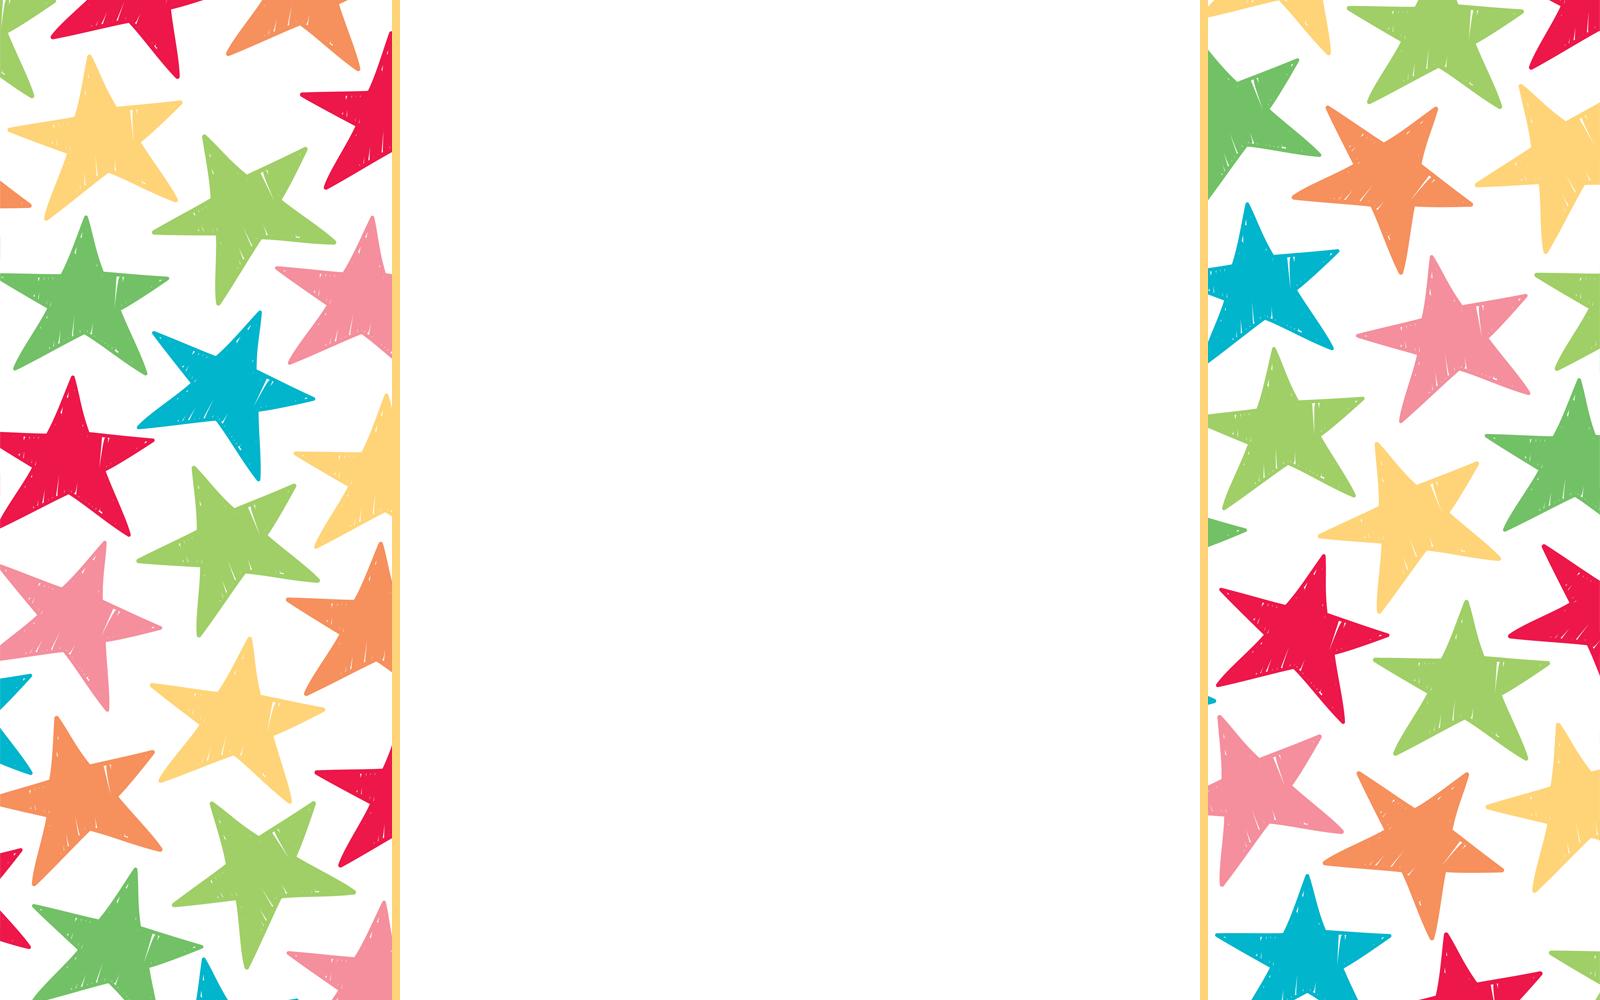 Star Border Clip Art - ClipArt Best